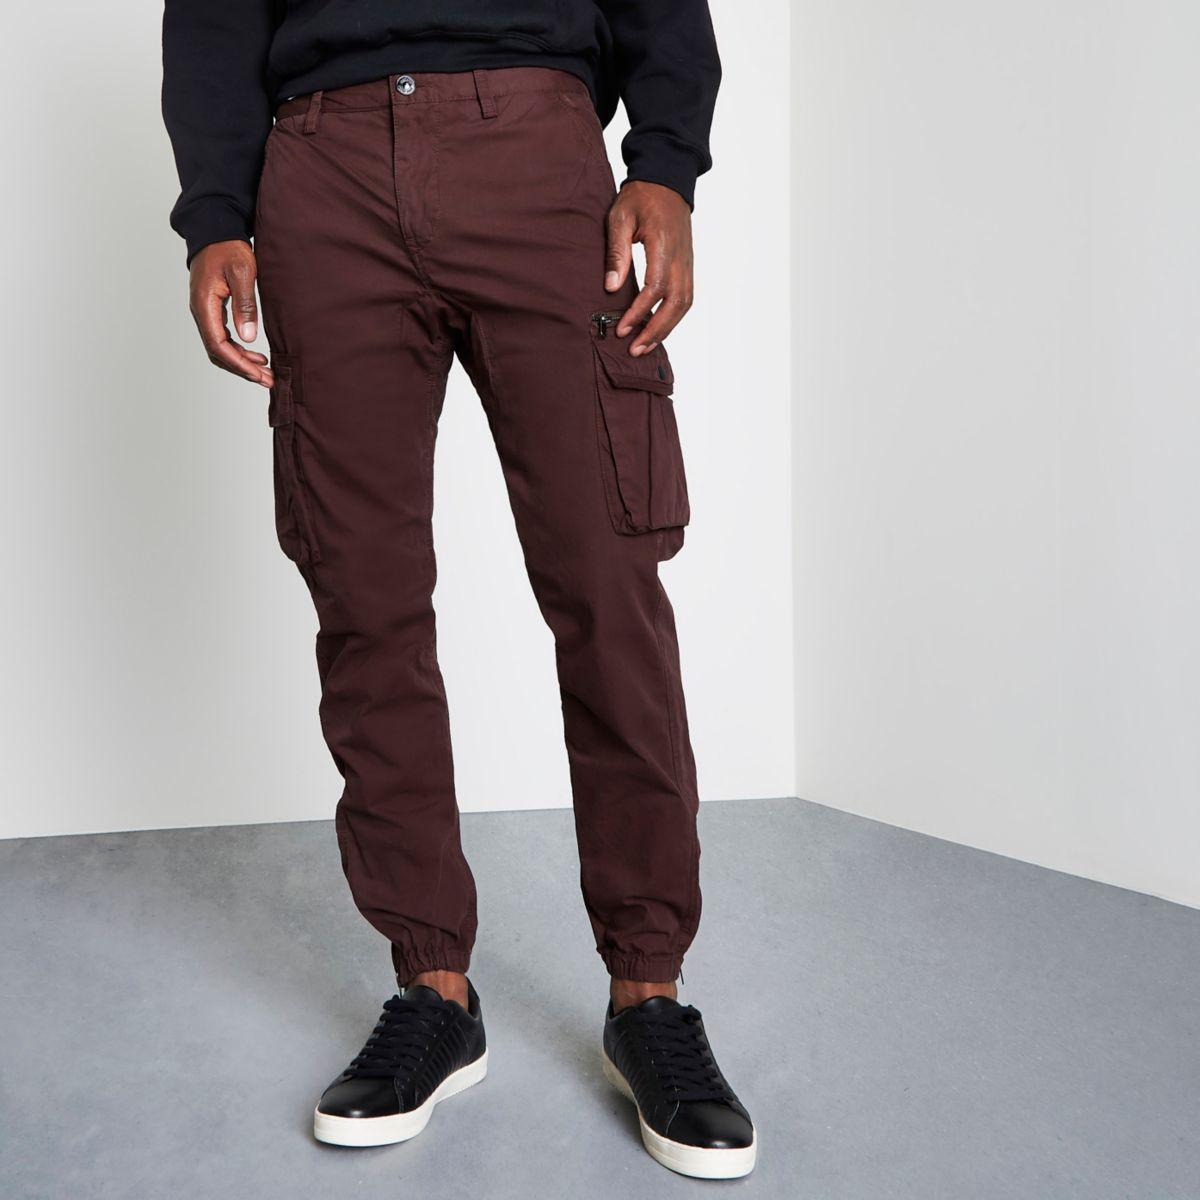 Burgundy cargo jogger pants